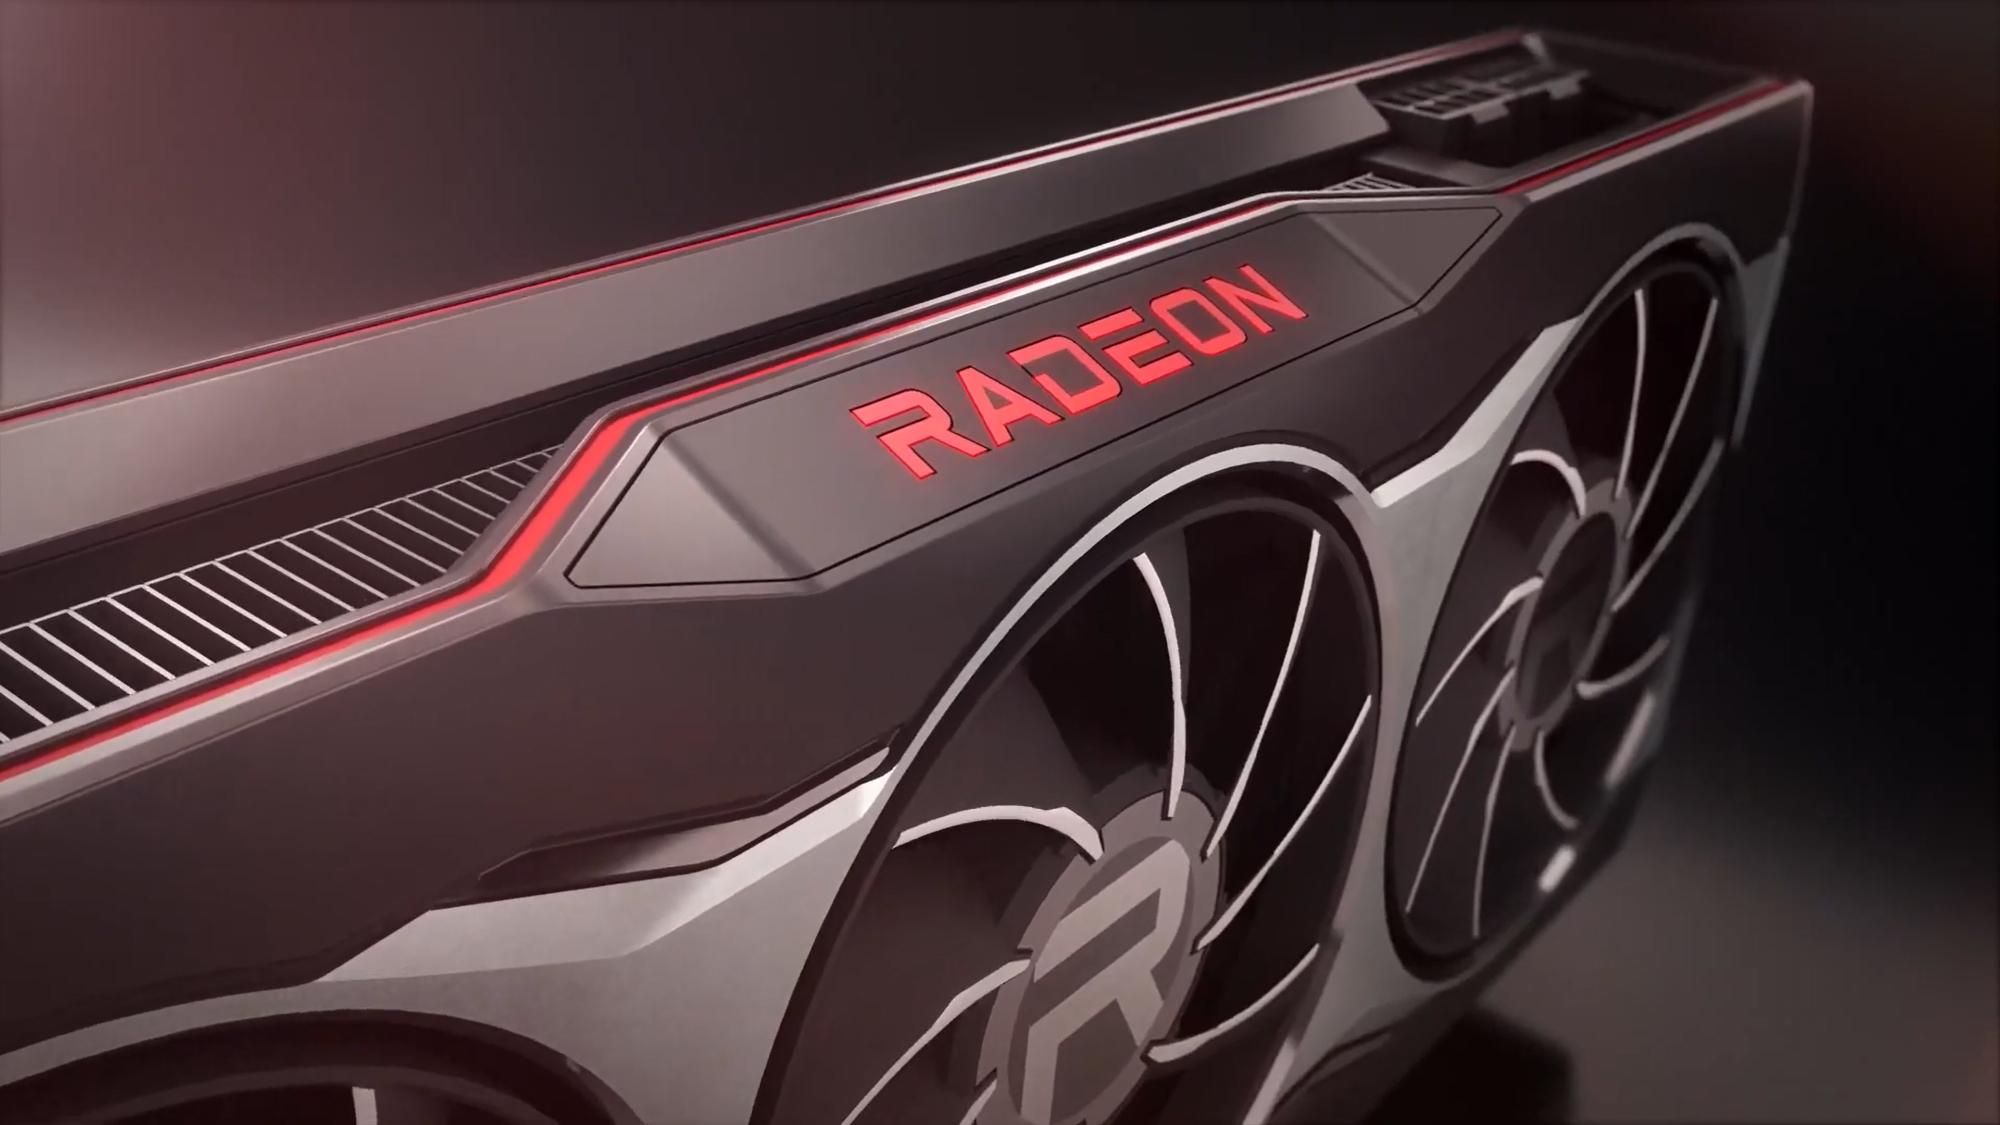 RX 6800 Resizable bar RX 6000